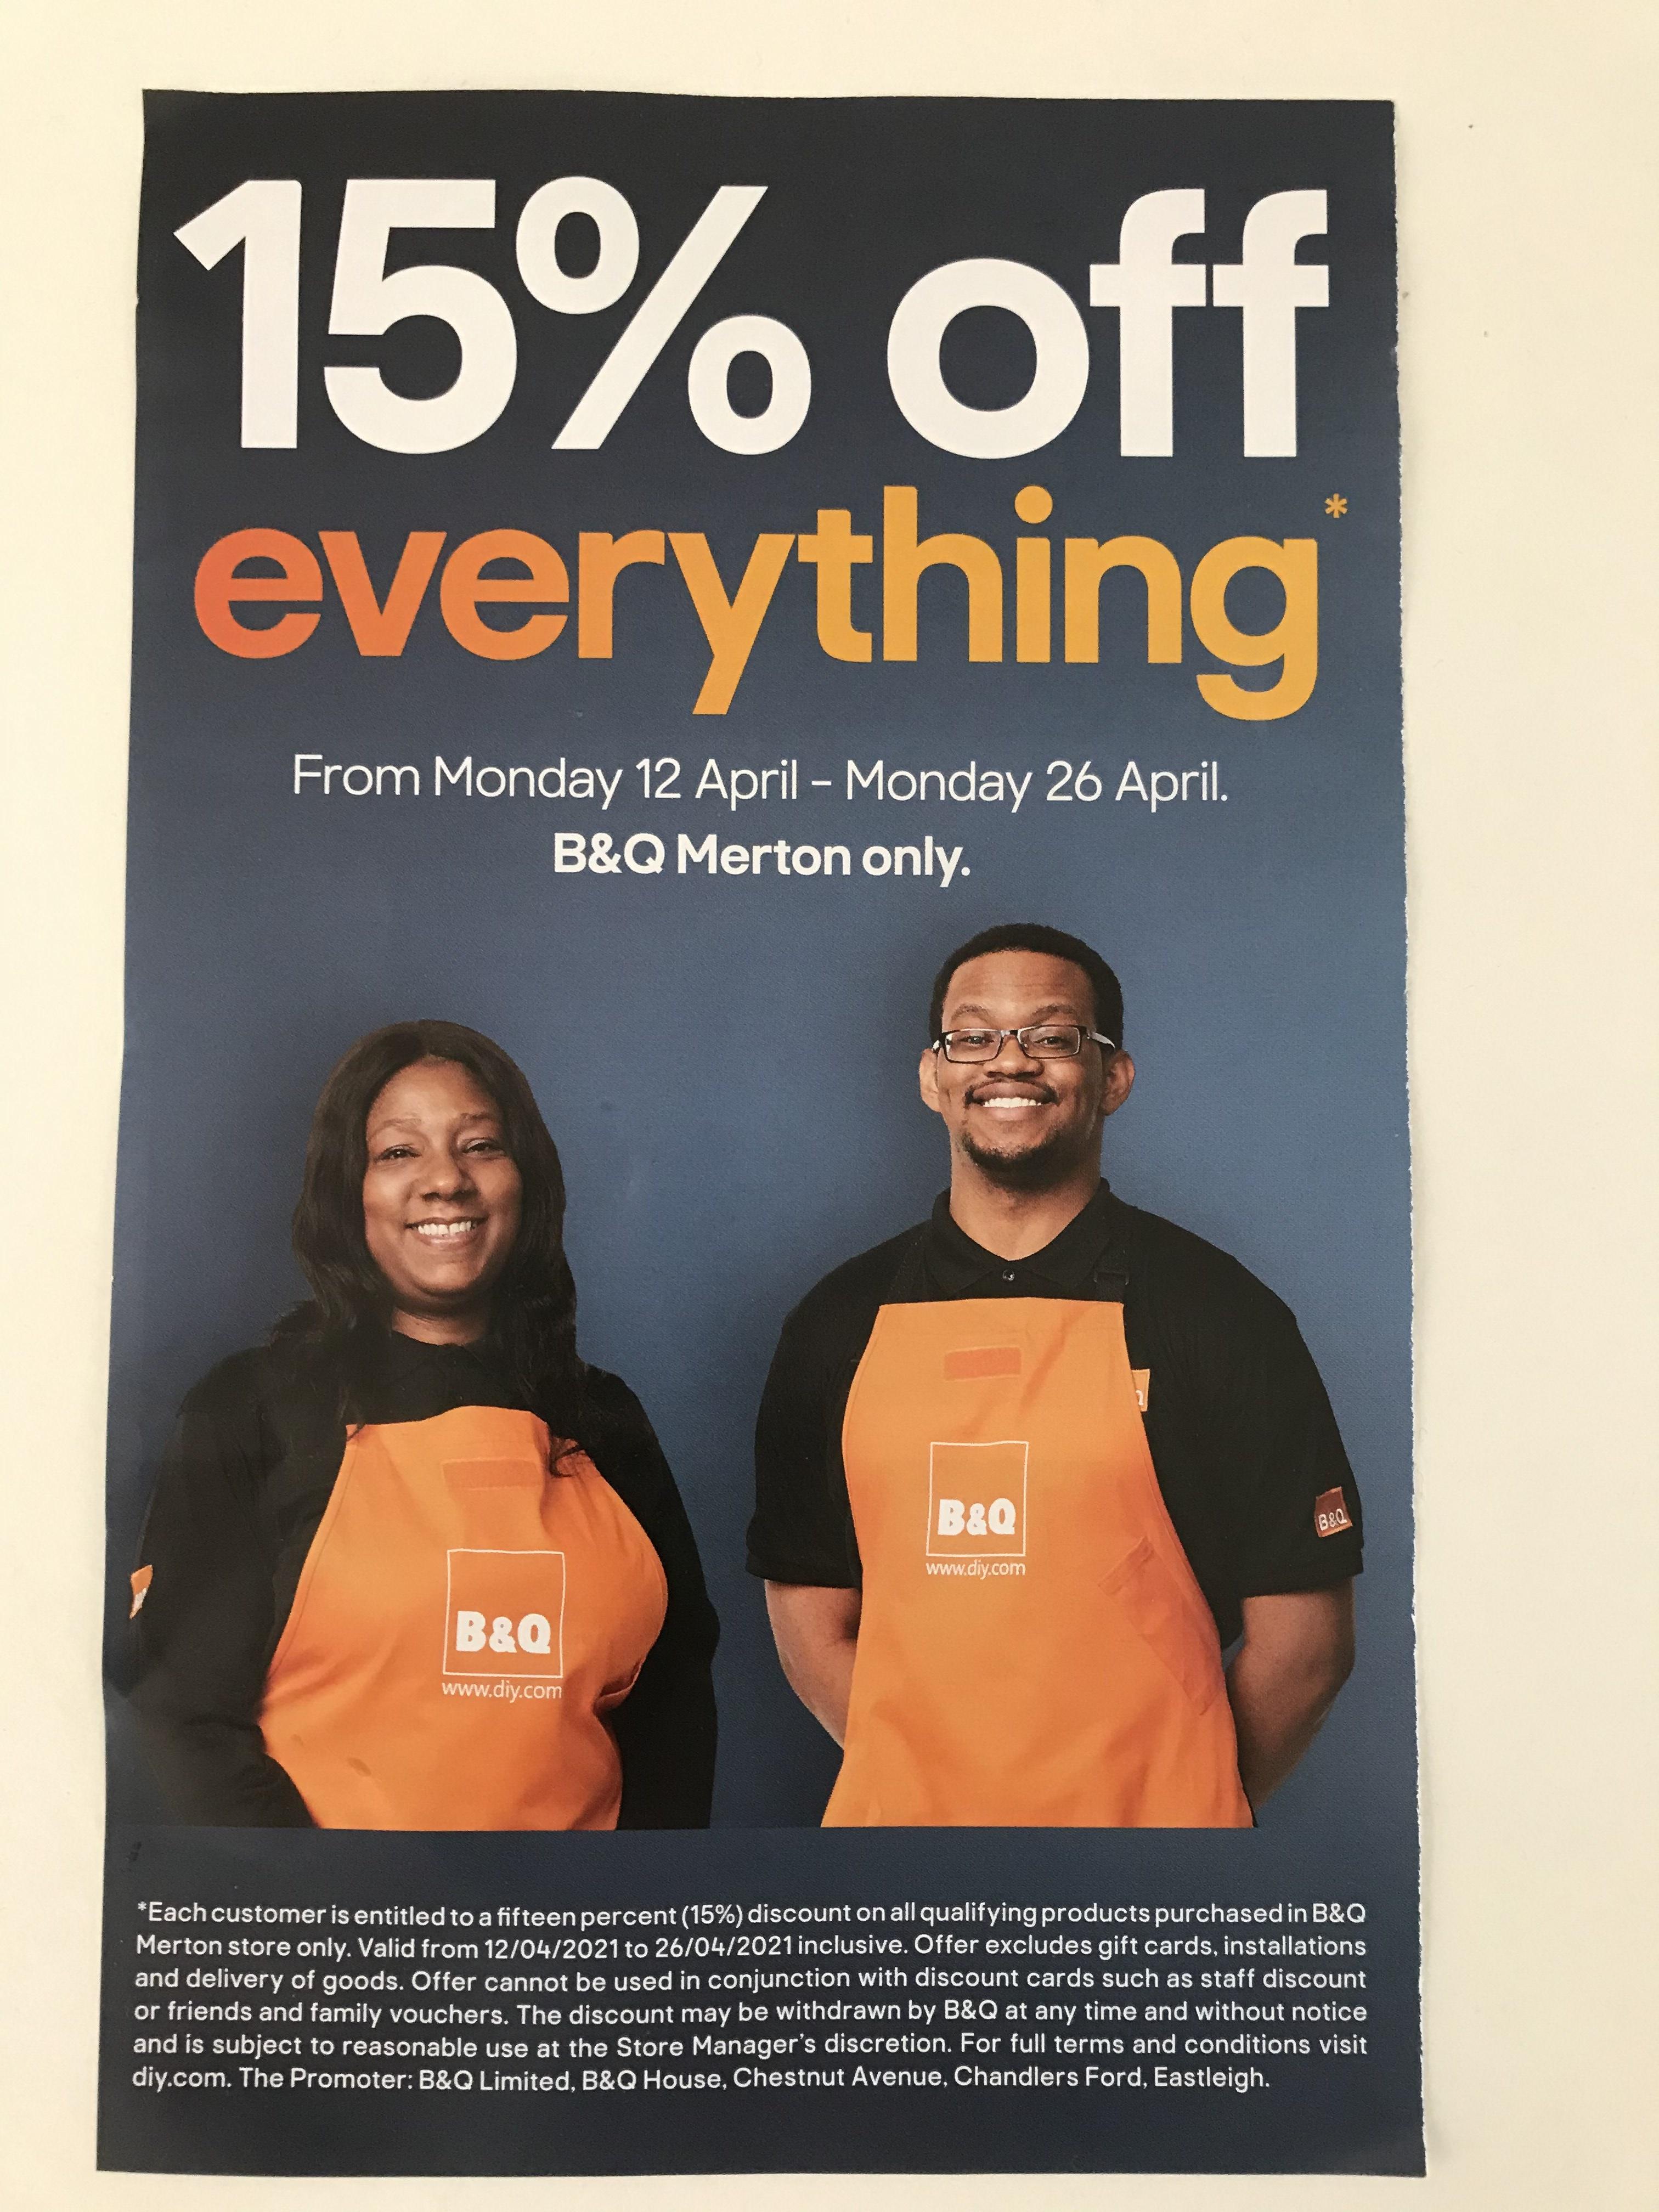 15% off everything at B&Q Merton